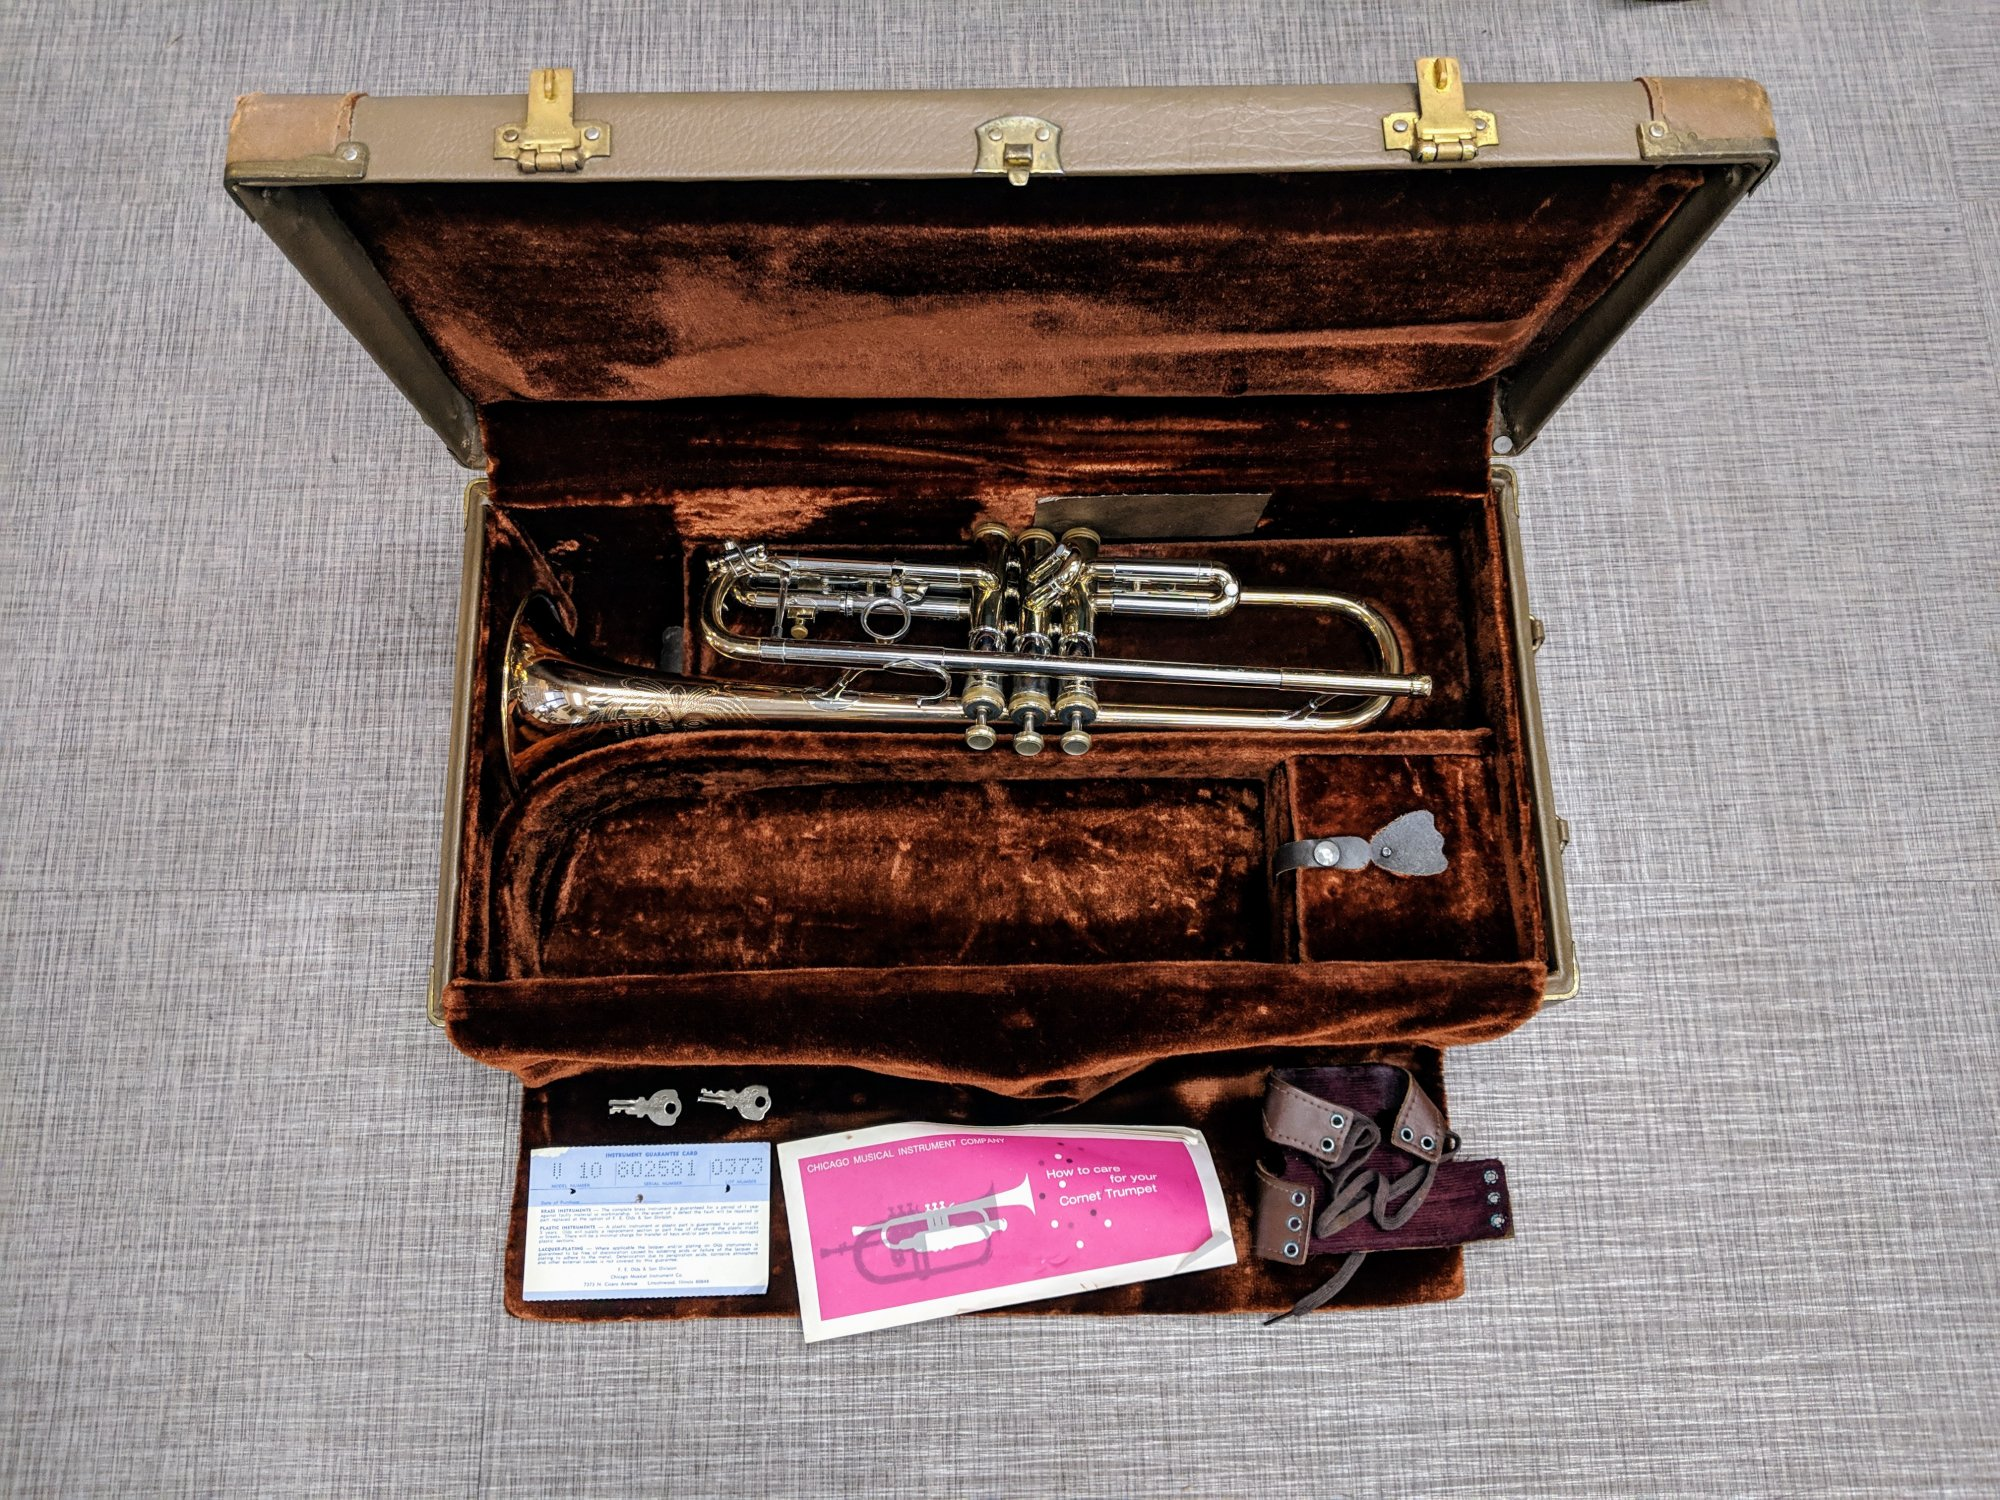 Olds Recording Trumpet - Used Vintage Fullerton